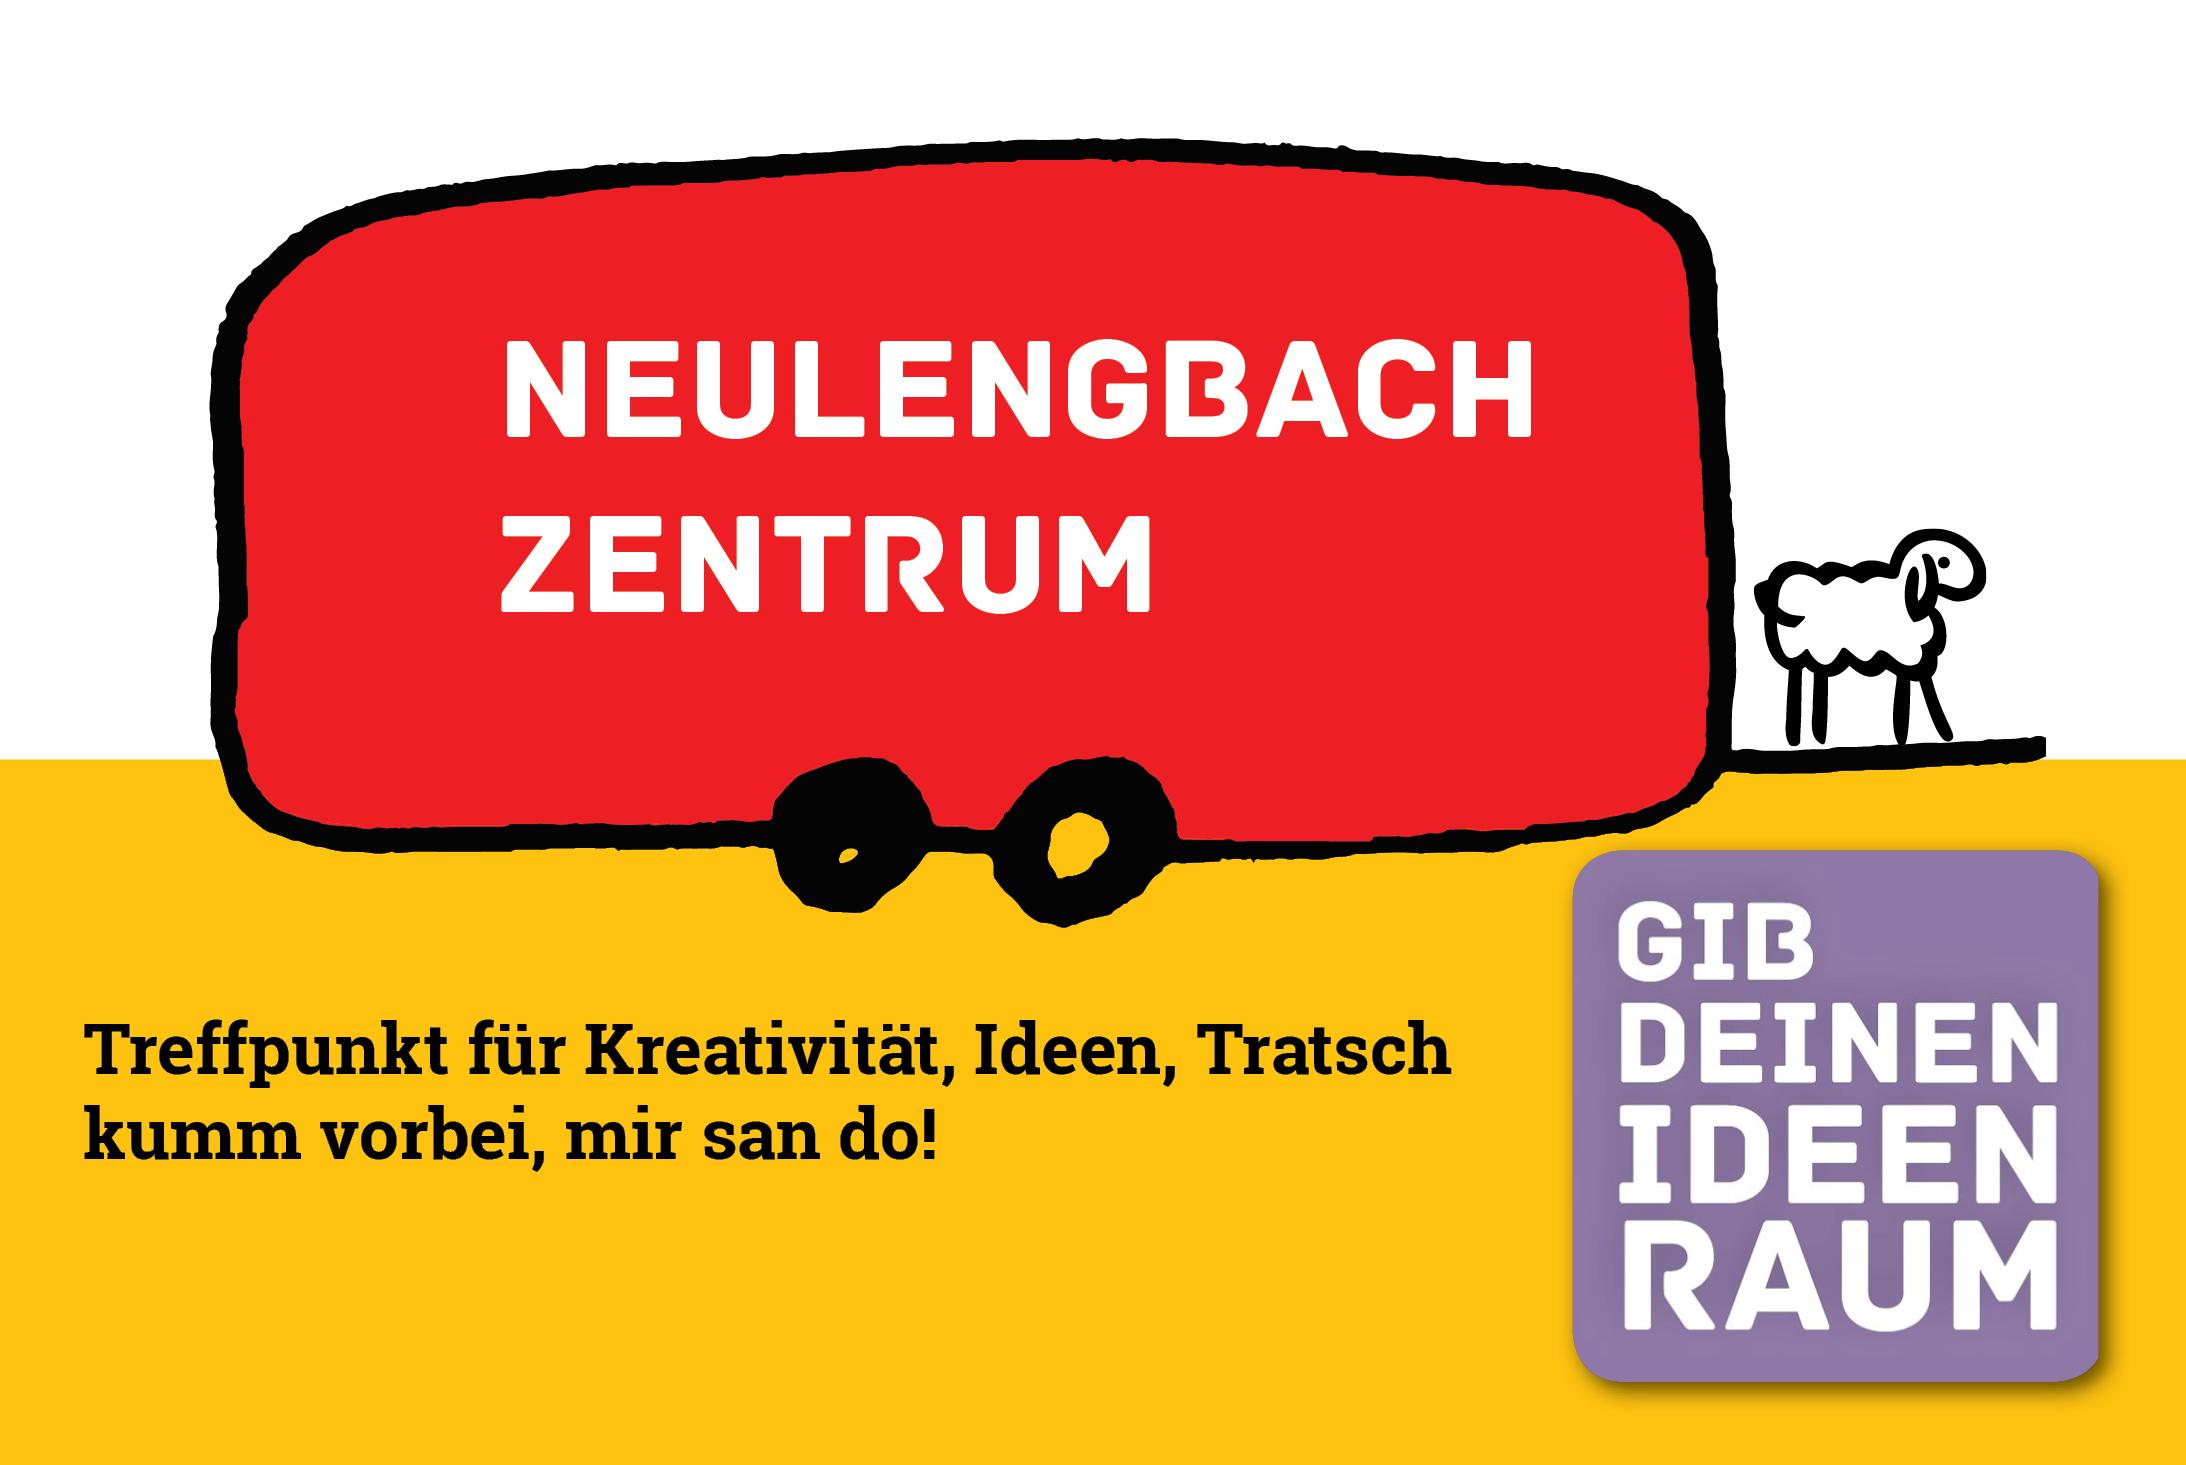 2019_raumwagen1_neulengbach_185x124